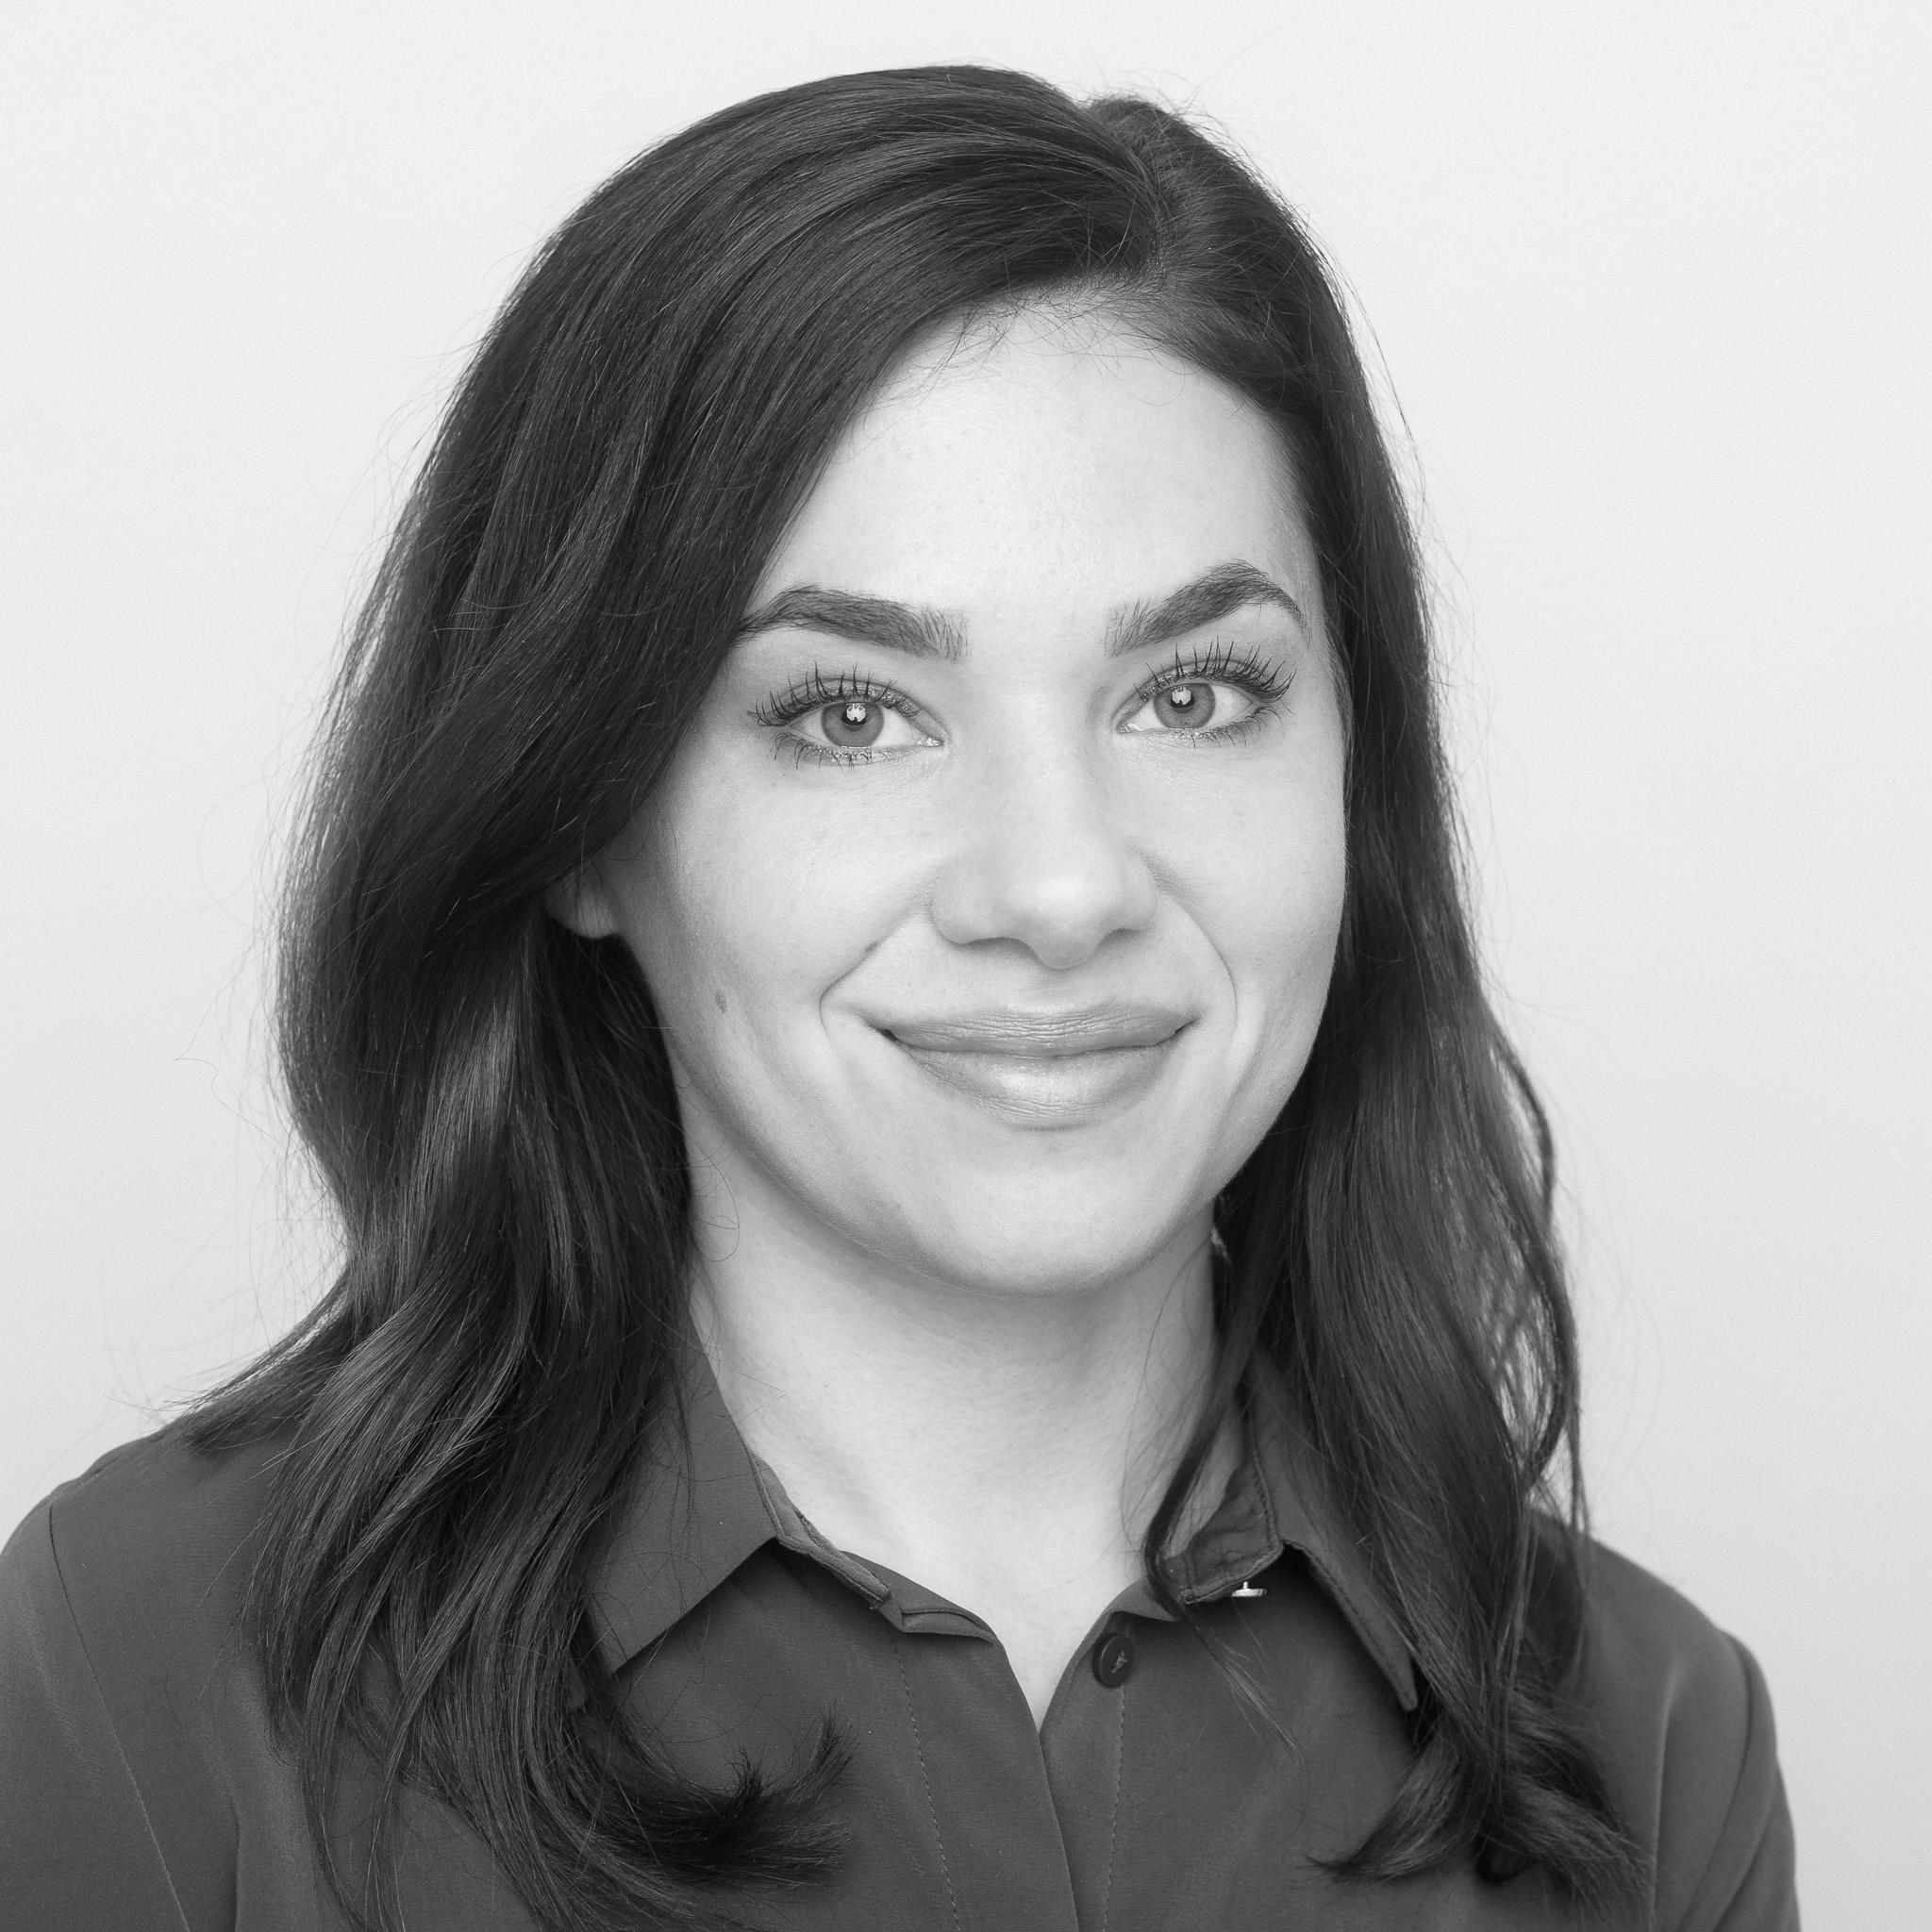 Laura Wellmann